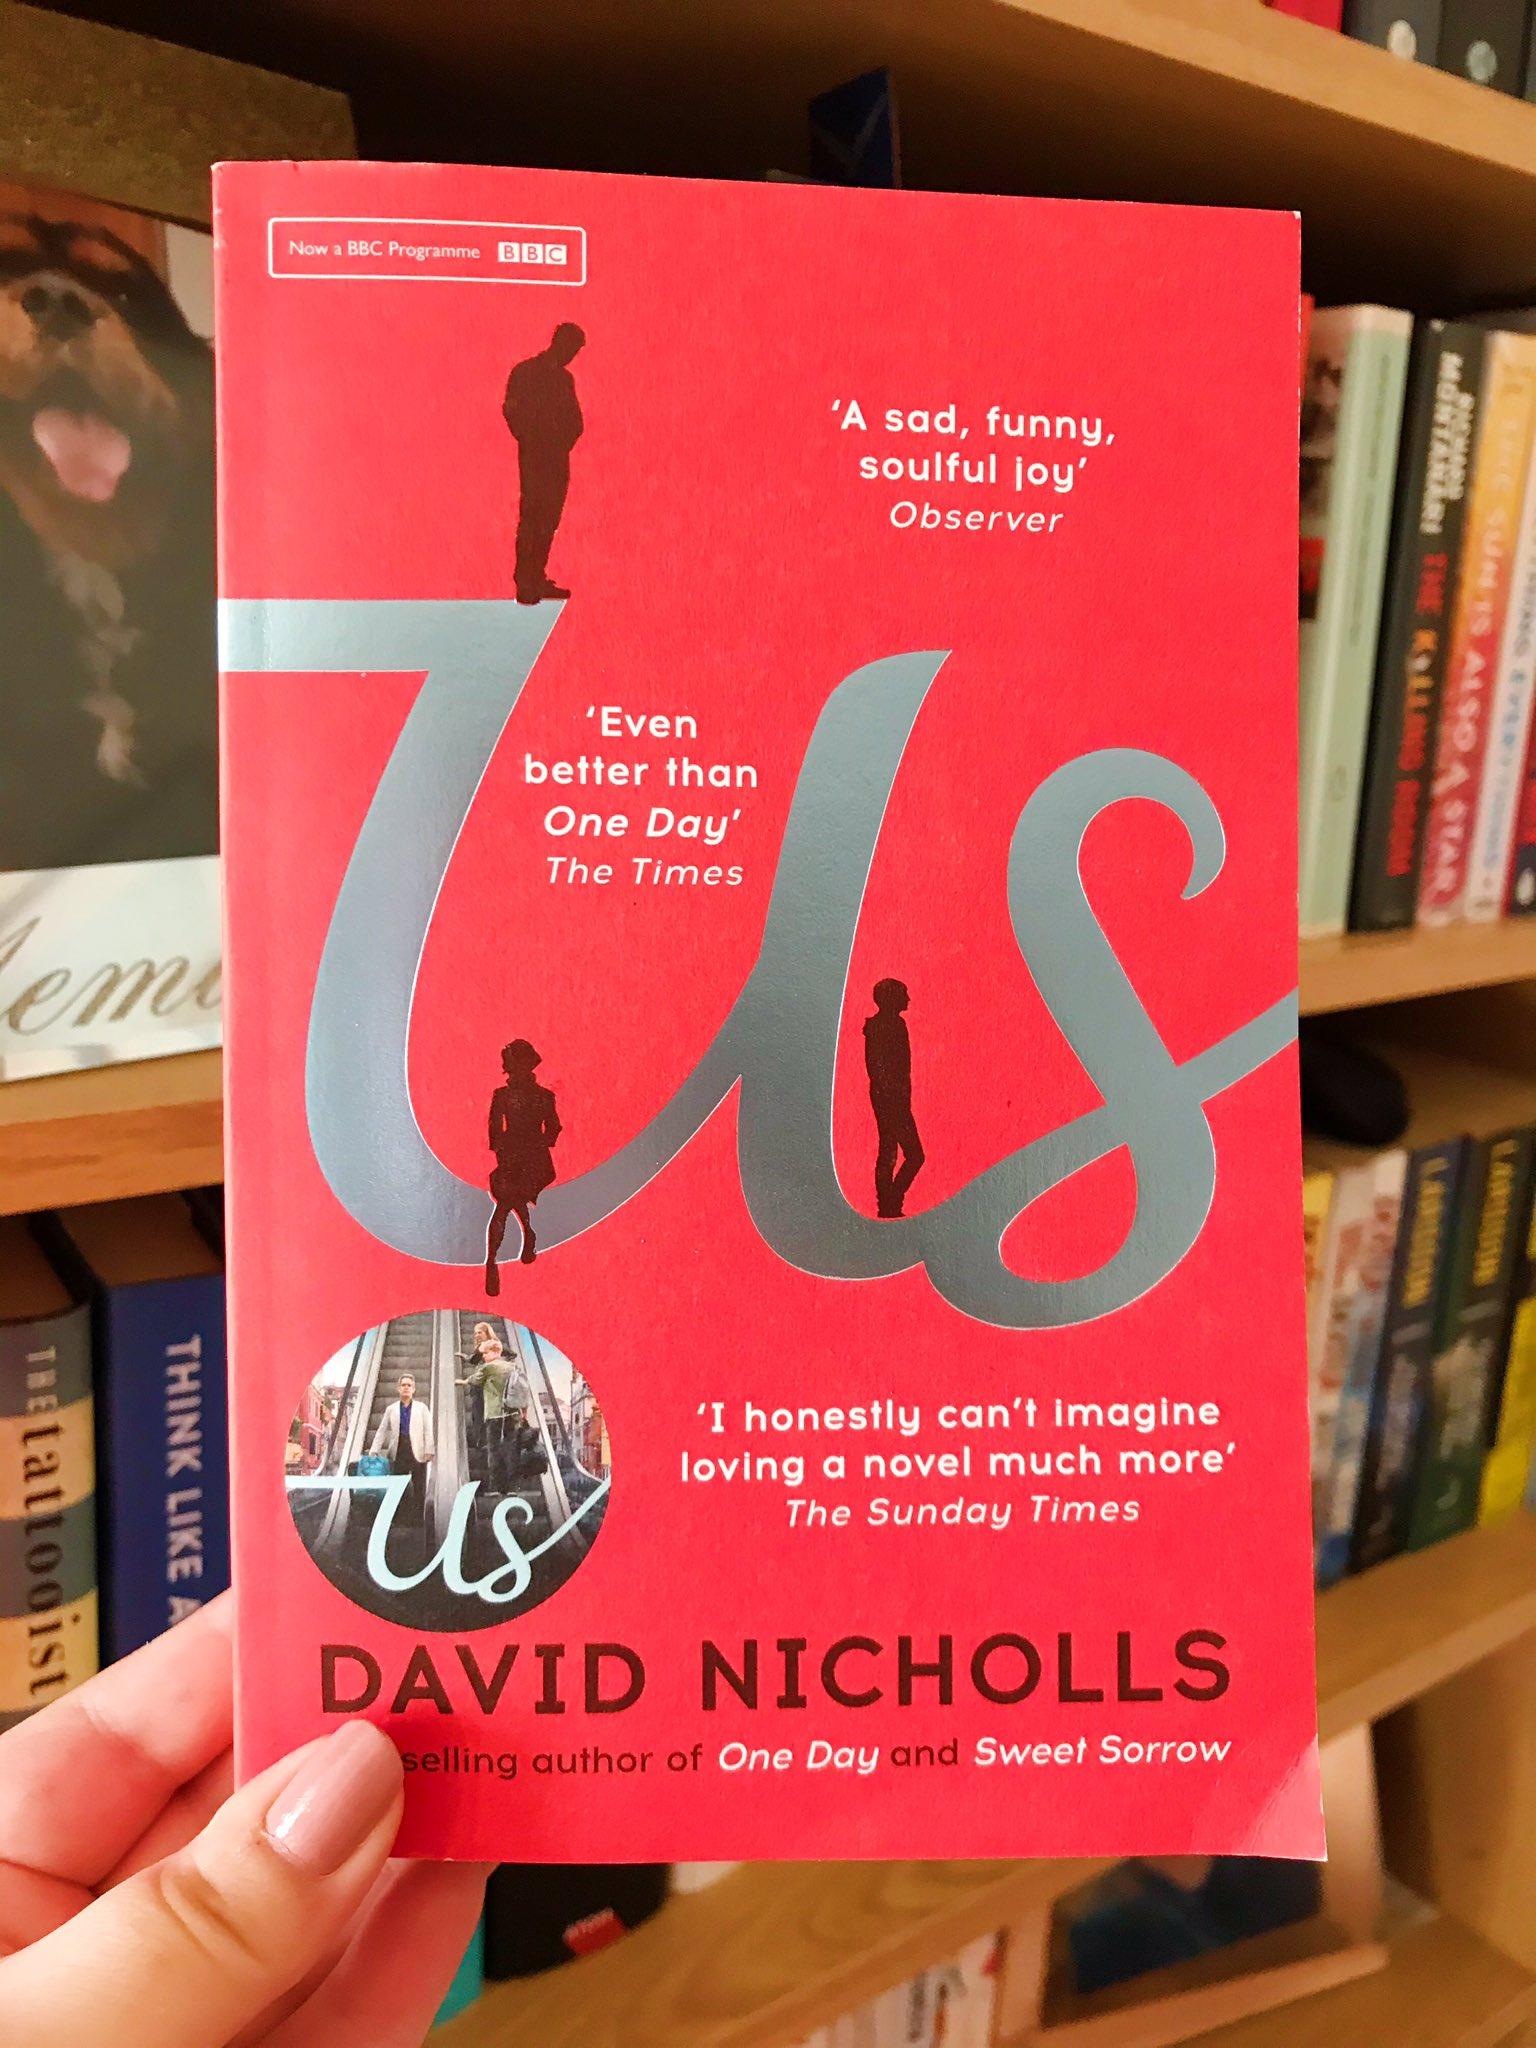 Us by David Nicholls held up in front of bookshelf